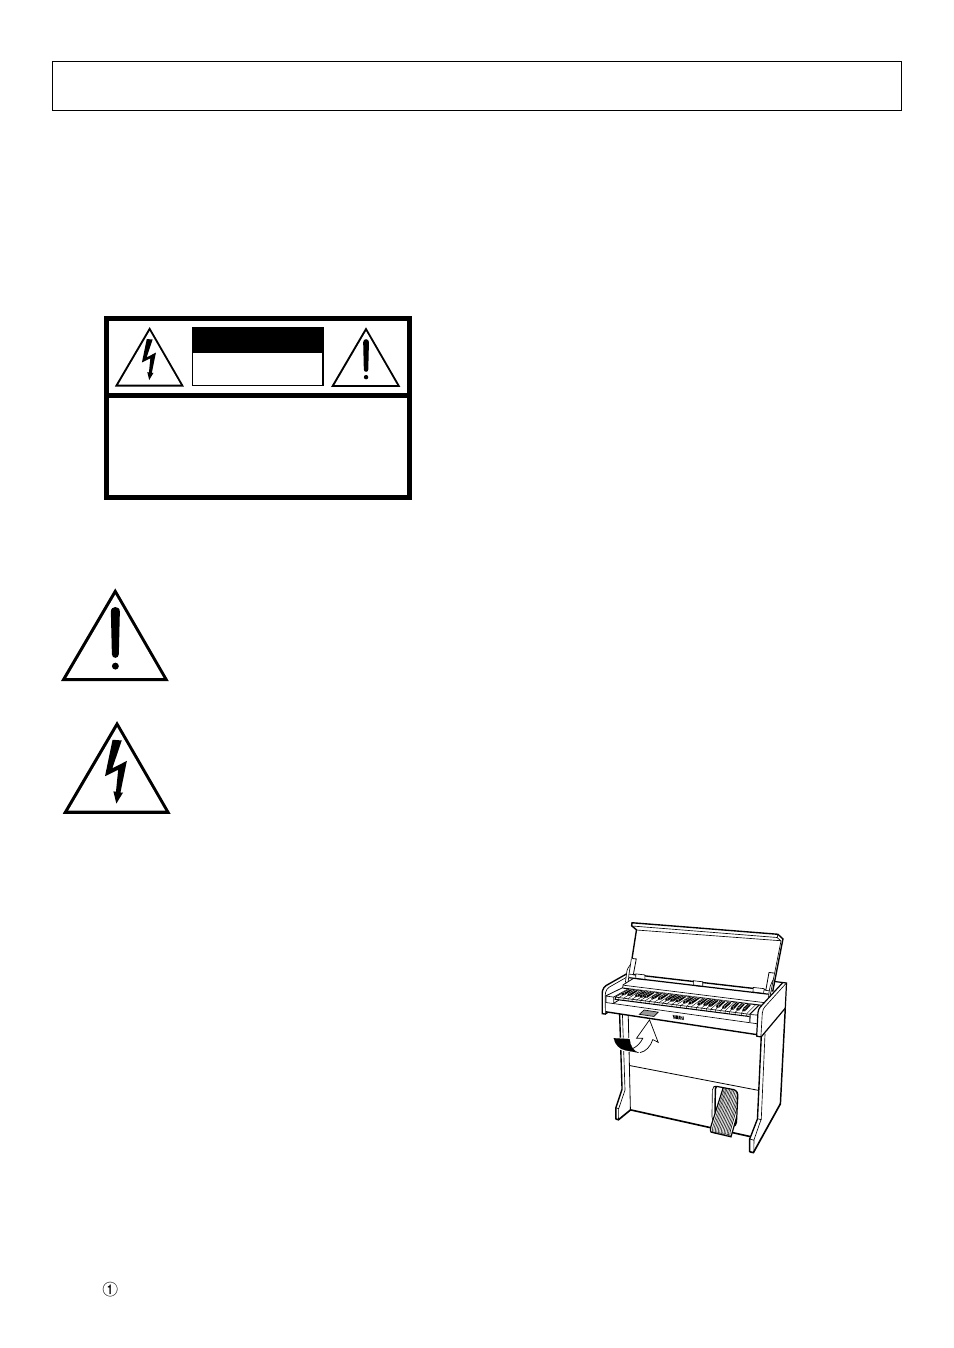 hight resolution of yamaha wiring symbol